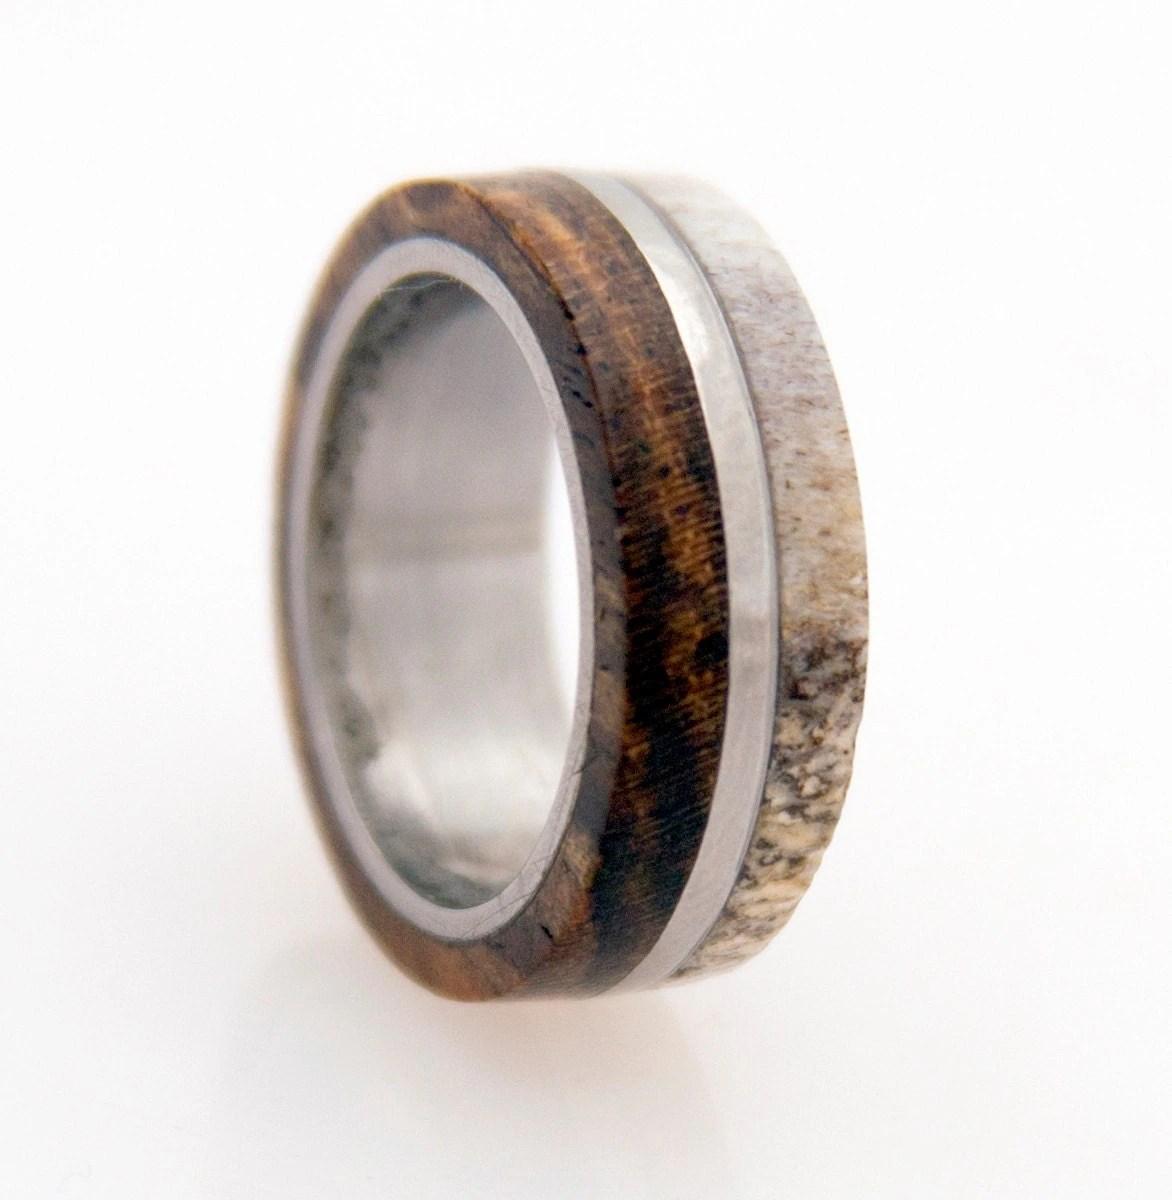 Antler Ring Titanium Ring With Wood Bocote Deer By